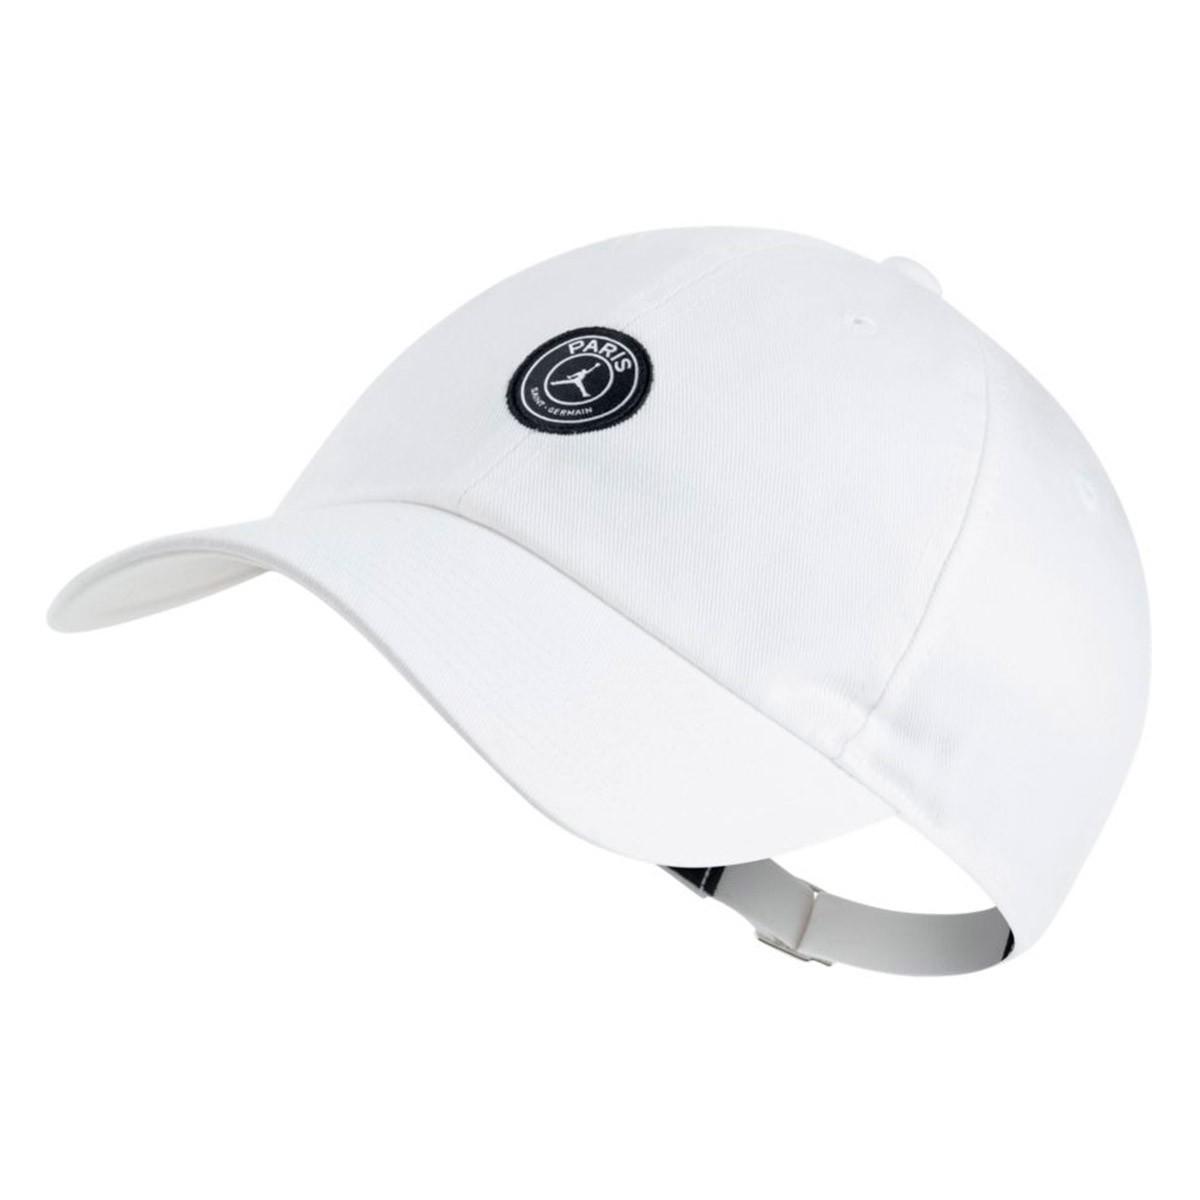 327a5ad4dd094 Cap Nike Jordan x PSG Heritage 86 White - Tienda de fútbol Fútbol ...